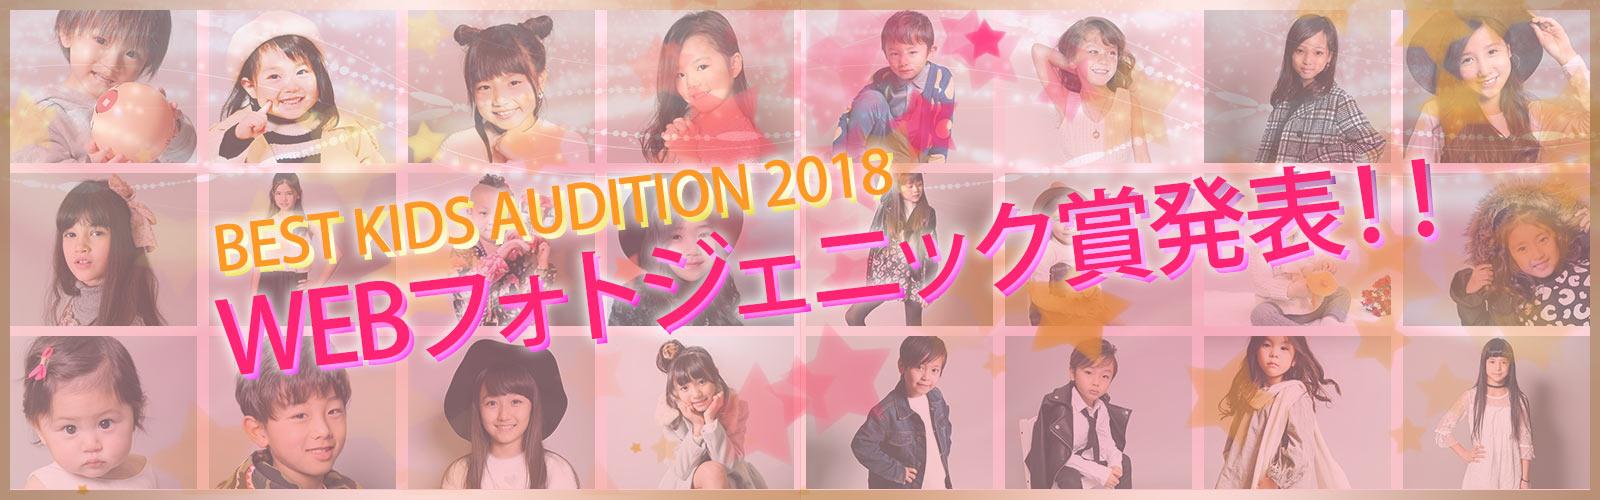 WEBフォトジェニック賞2018 発表